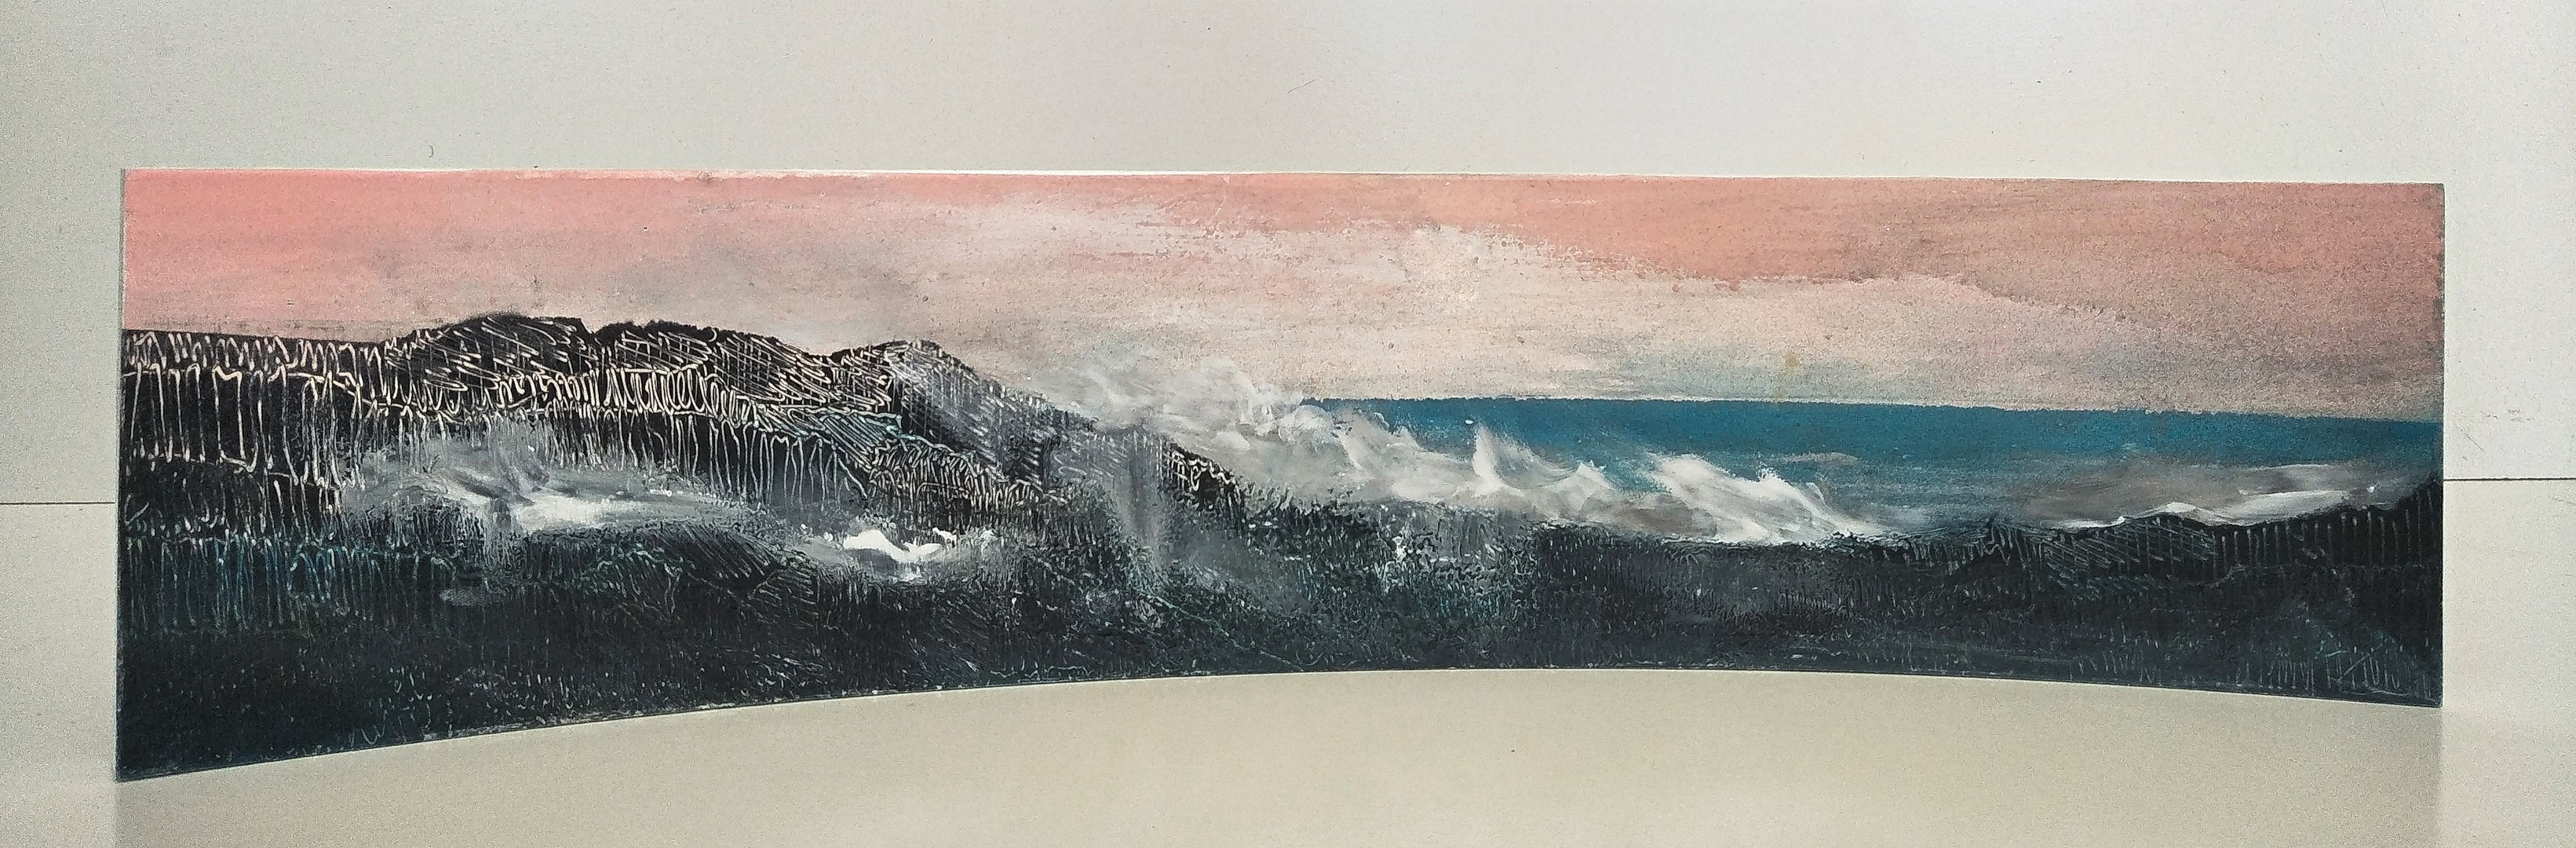 Oceans Away Side A-1.jpg